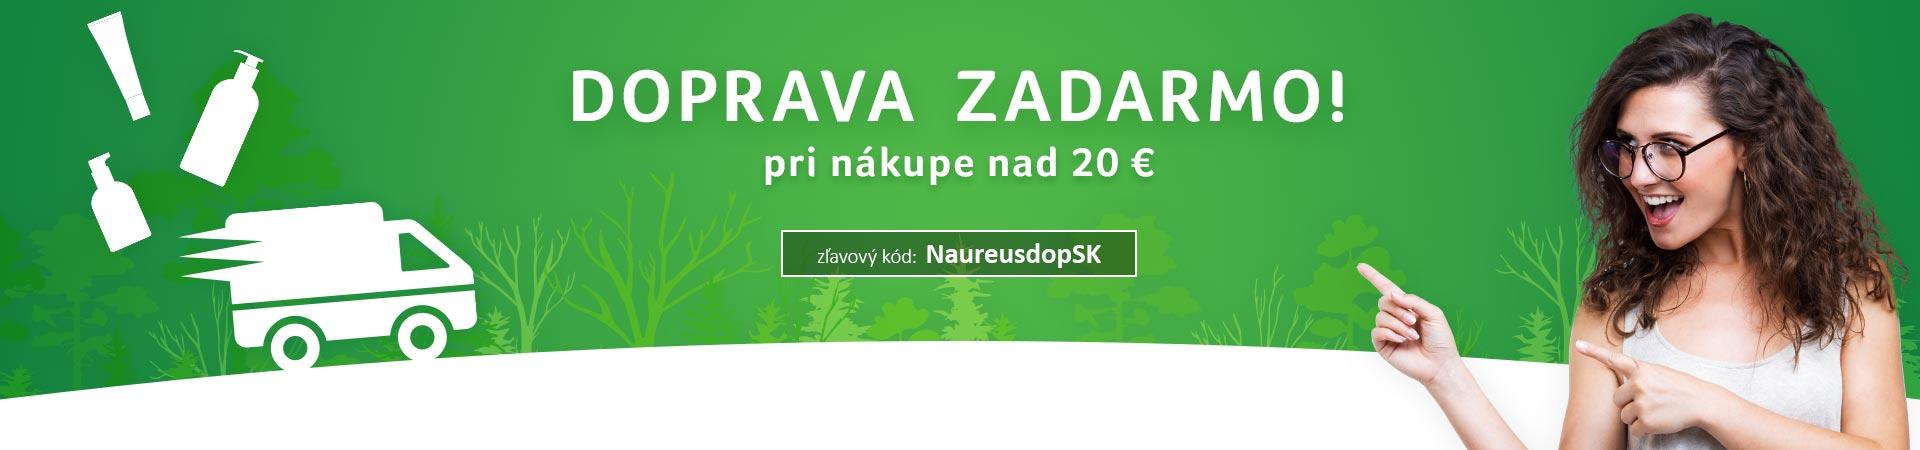 Doprava zadarmo nad 20 eur do 18.08.2019